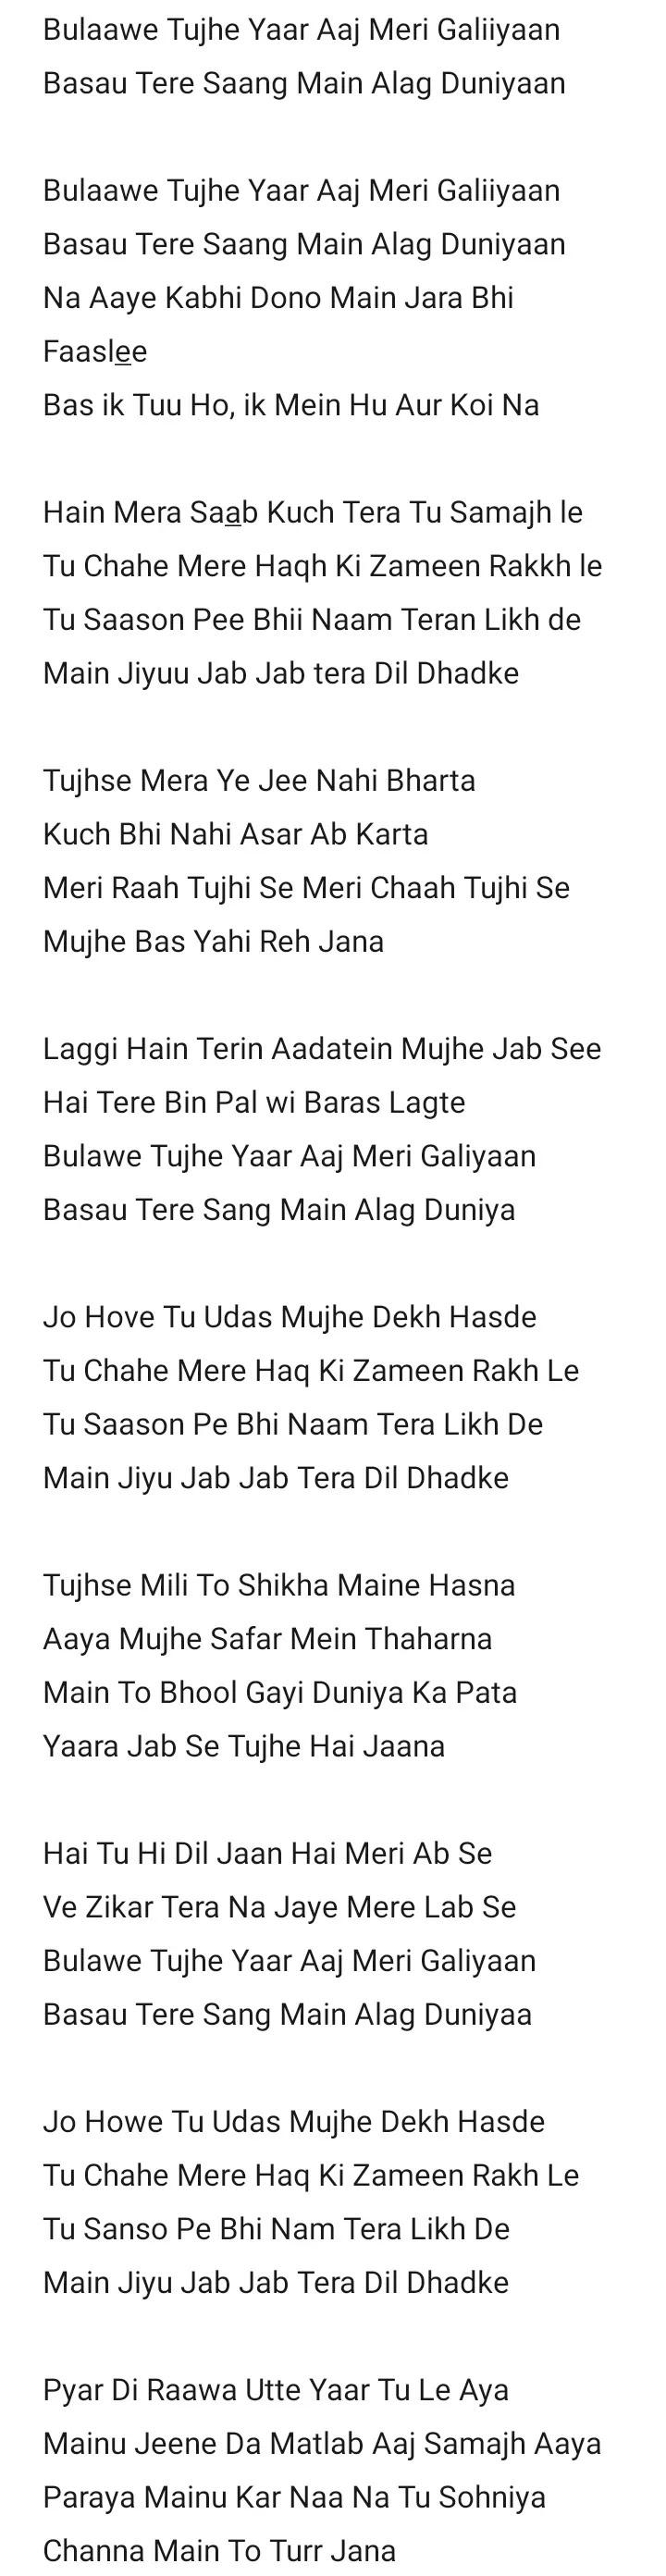 duniya lyrics - luka chuppi | kartik Aaryan and kriti sanon